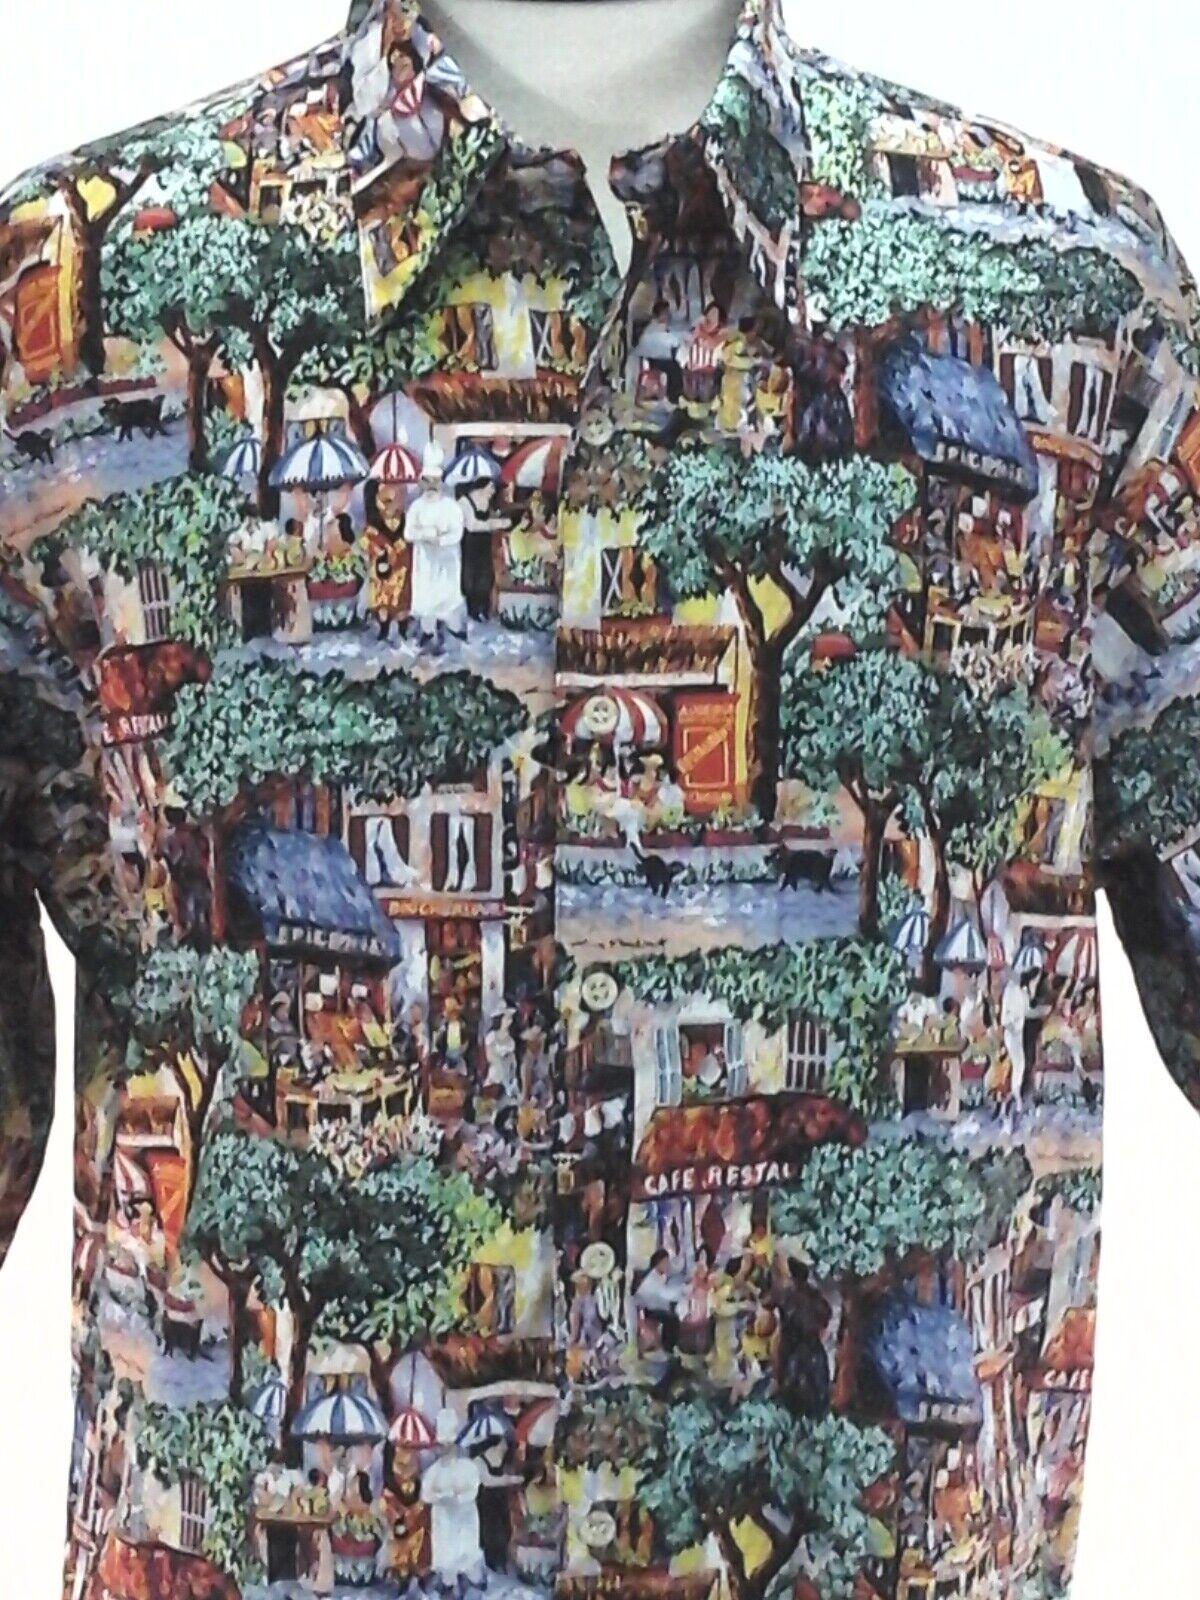 REYN SPOONER Hawaiian Shirt Guy Buffet Paris Cafe Chef VTG Egyptian Cotton sz L